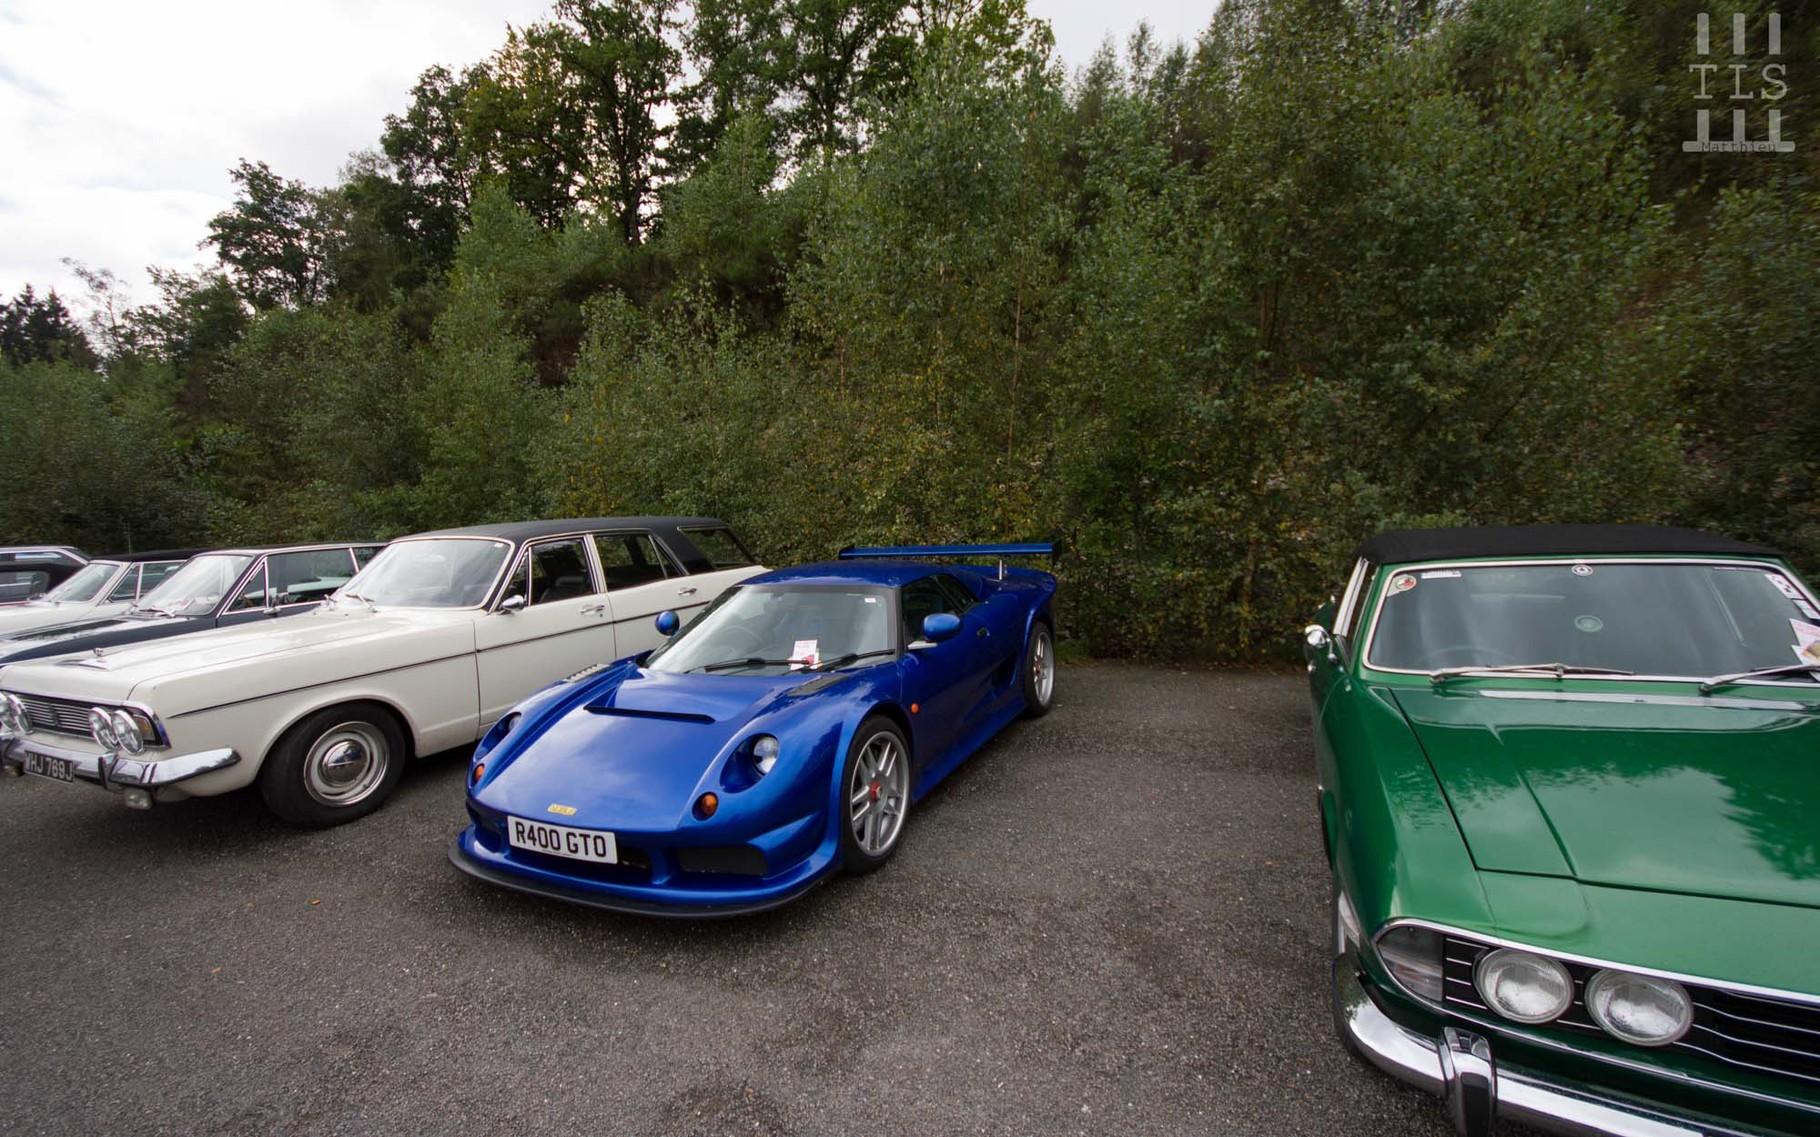 Noble M400 GTO